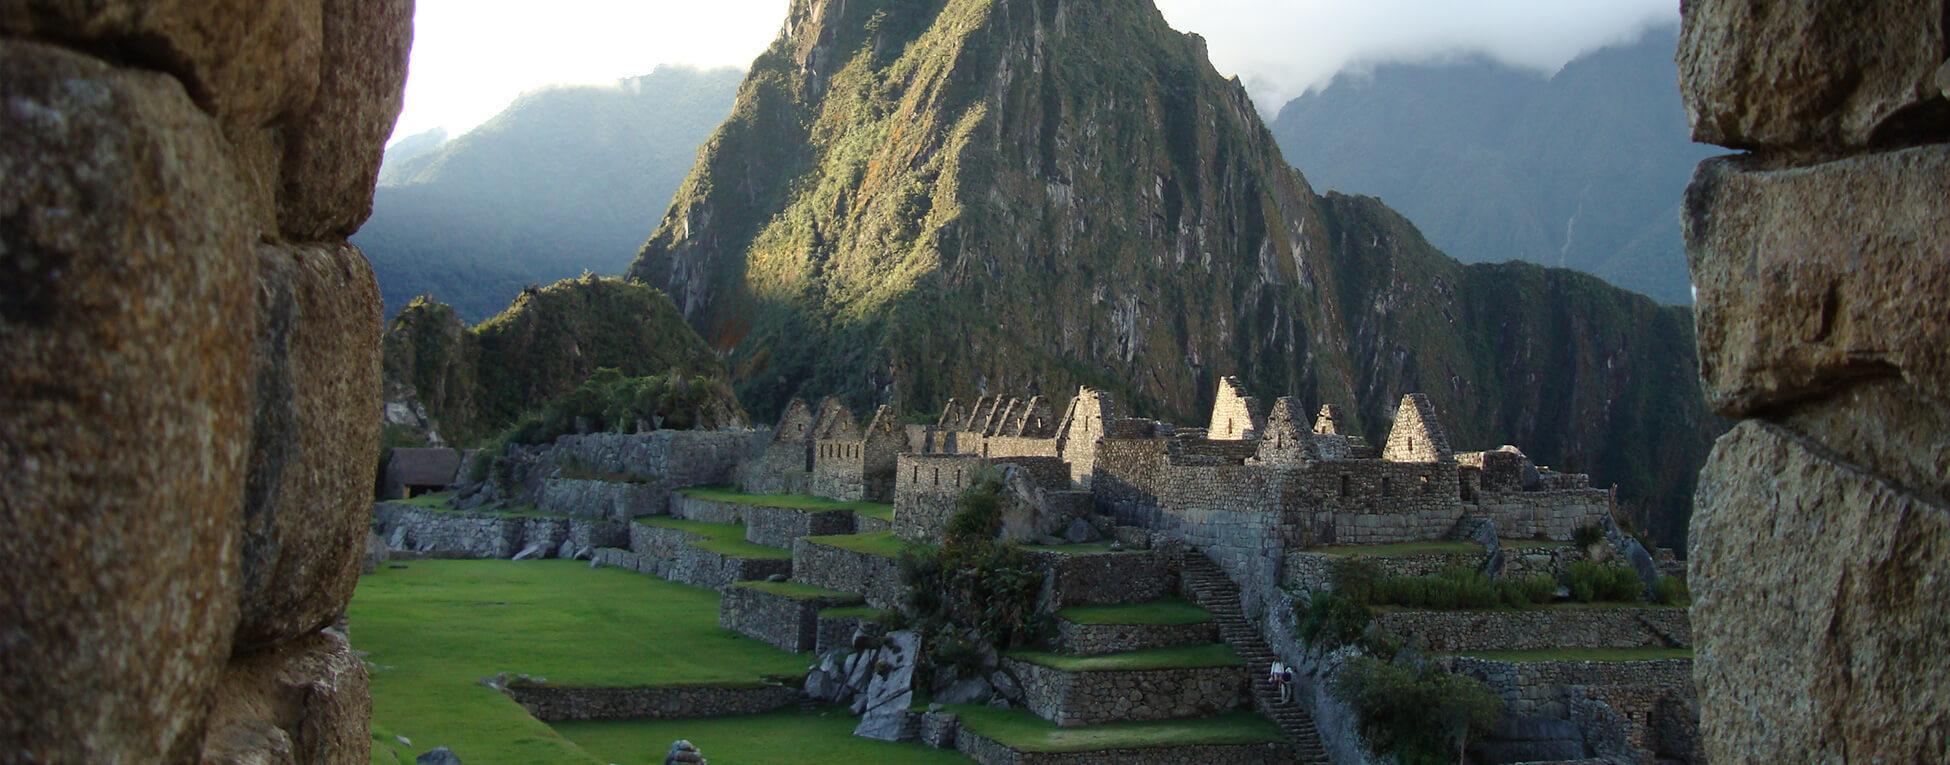 http://www.viaje-peru.es/uploads/slider/big/ejemplo-02.jpg